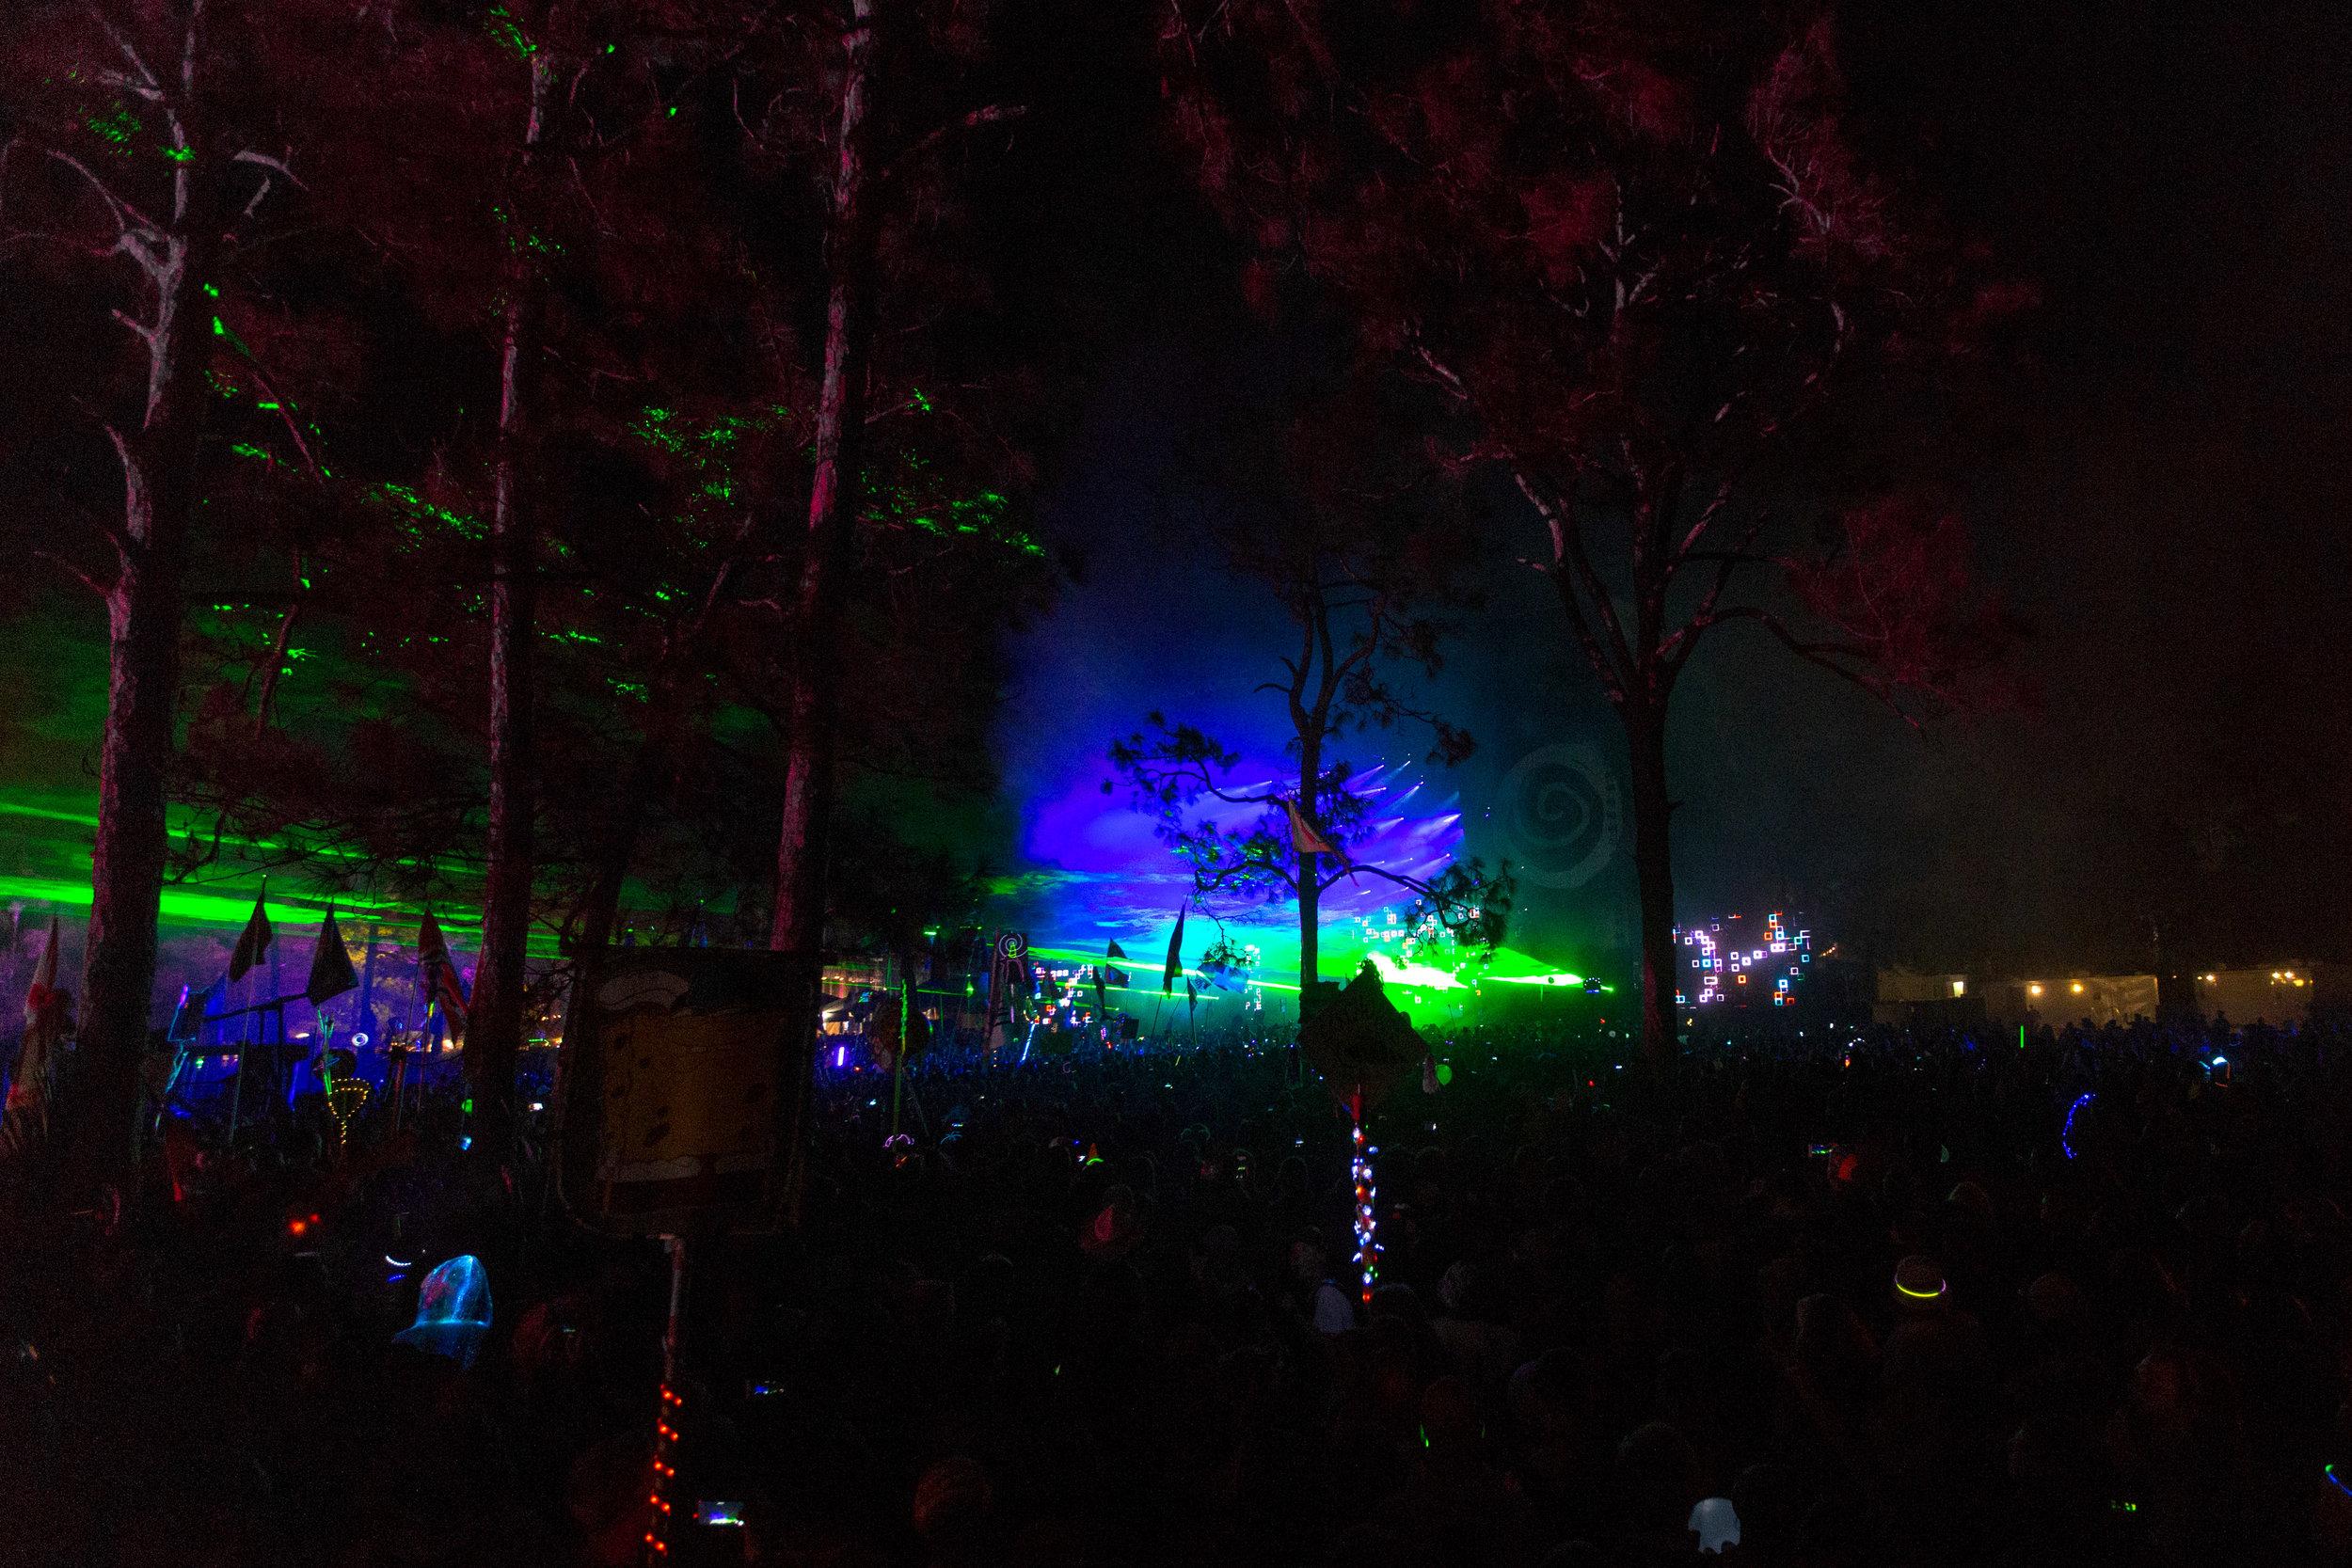 Bassnectar -  @bassnectar   Okeechobee Festival - March 4, 2017  Okeechobee, Florida